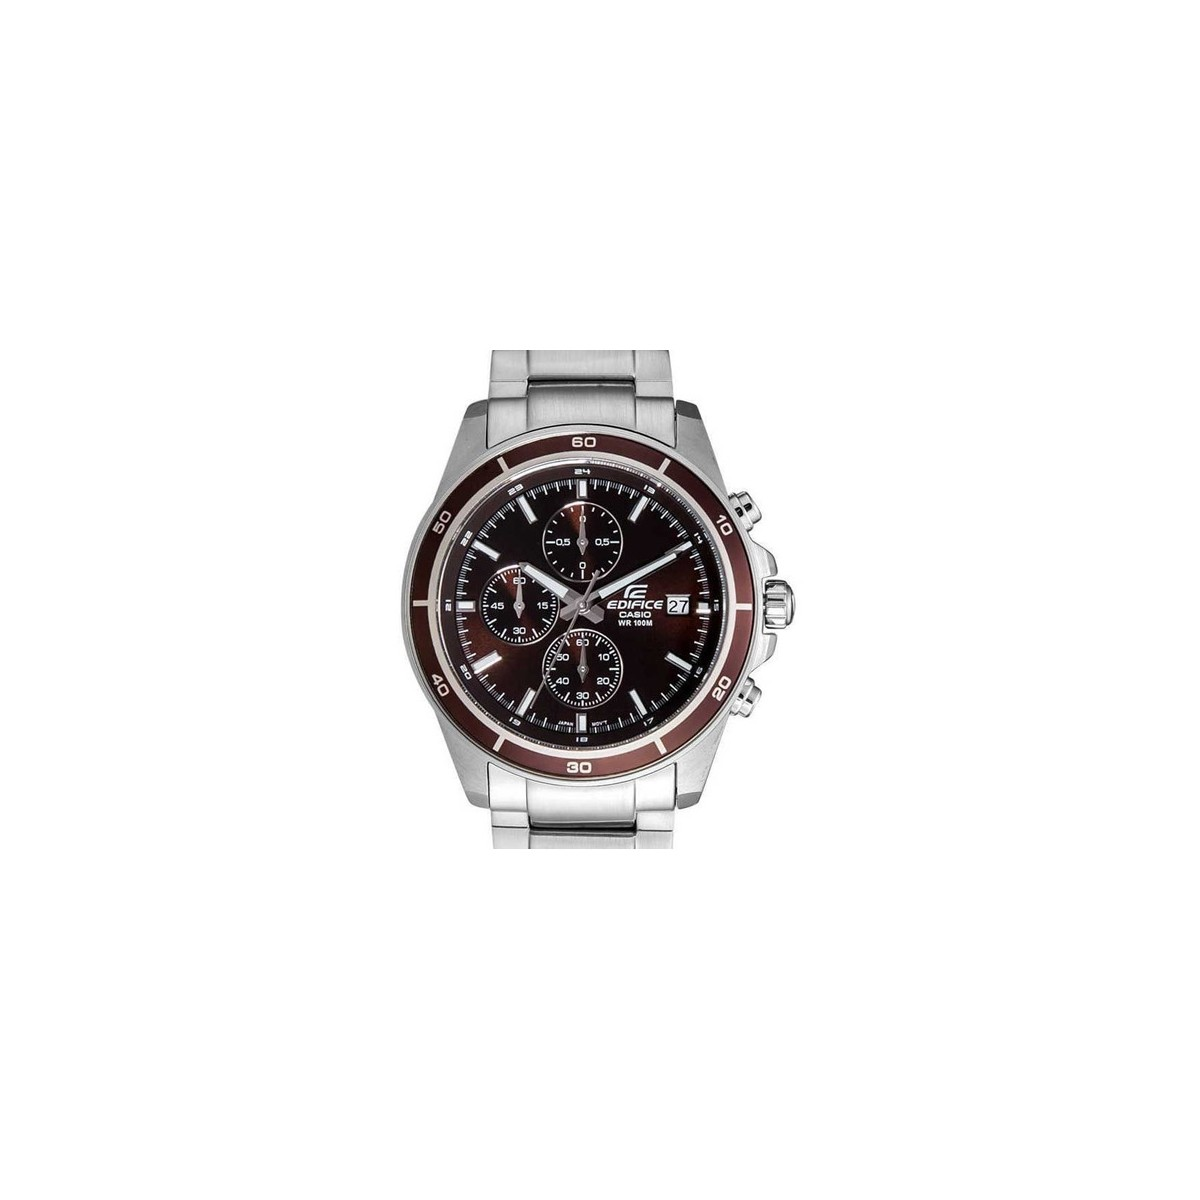 https://www.gaberjoyeria.com/5730-thickbox_default/reloj-casio-edifice.jpg